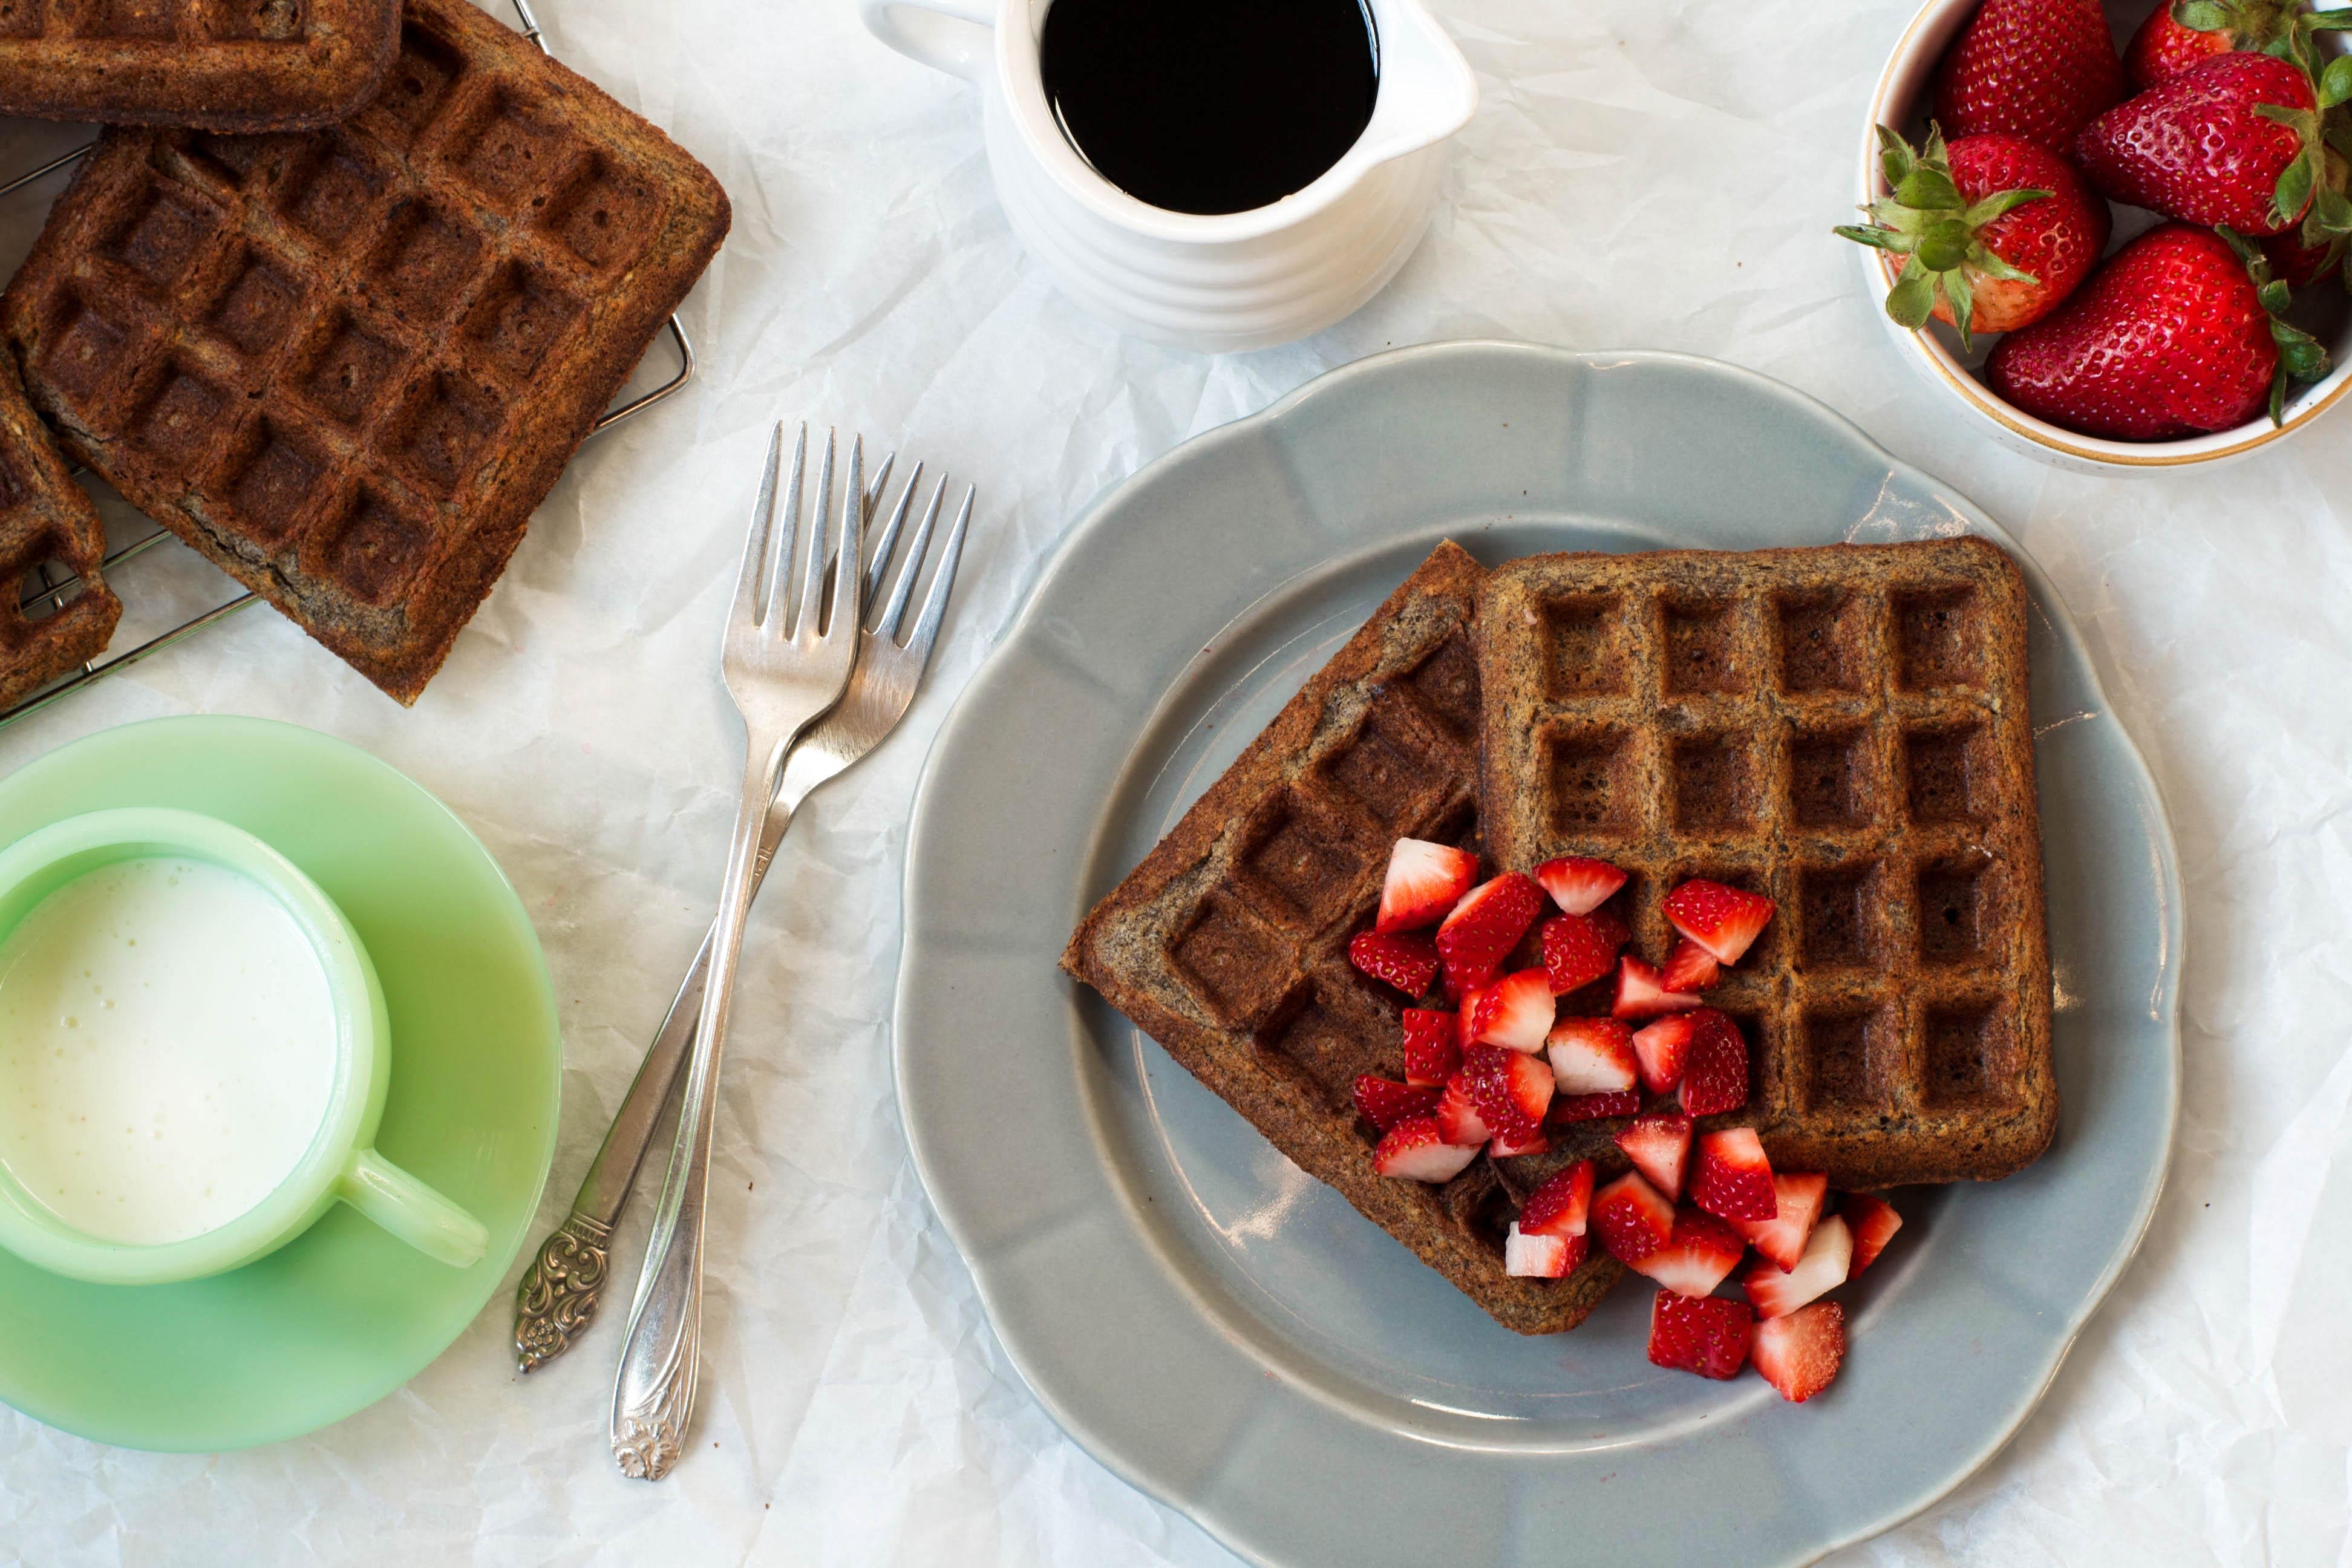 Gluten Free Buckwheat Waffles on a gray plate with strawberries | Zestful Kitchen